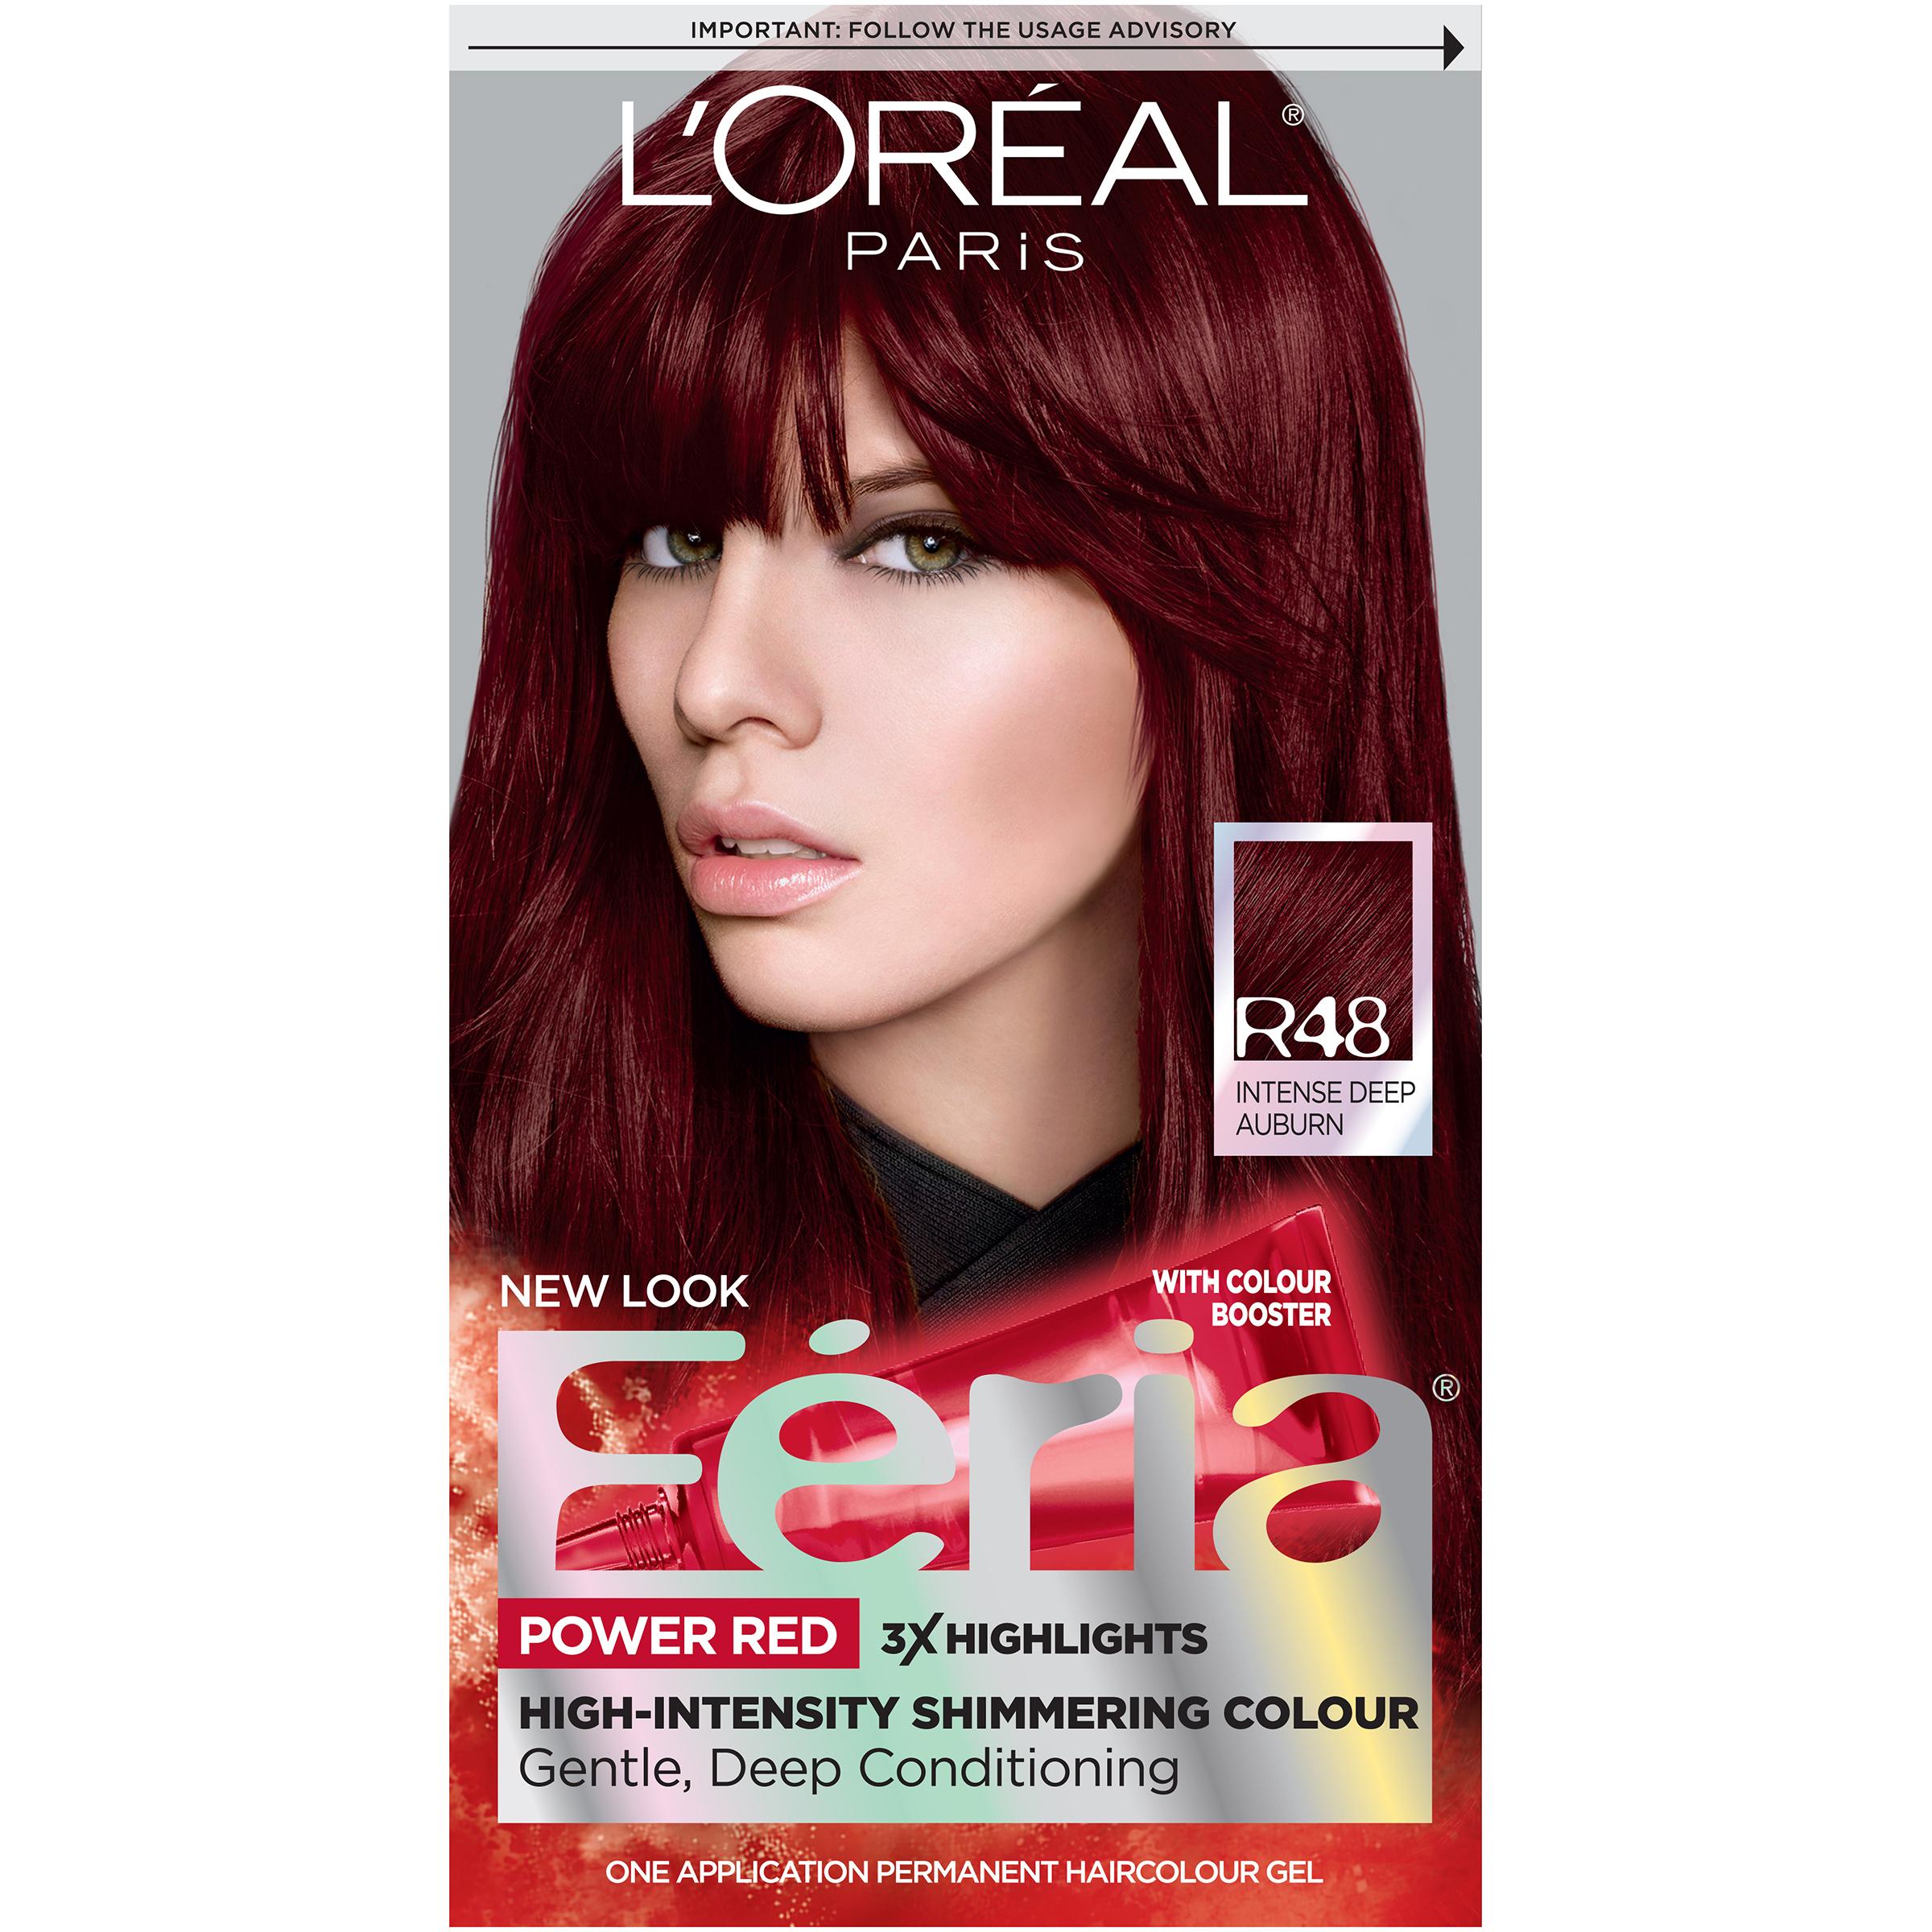 Loreal Paris Feria Power Reds Permanent Haircolour Gel R48 Intense